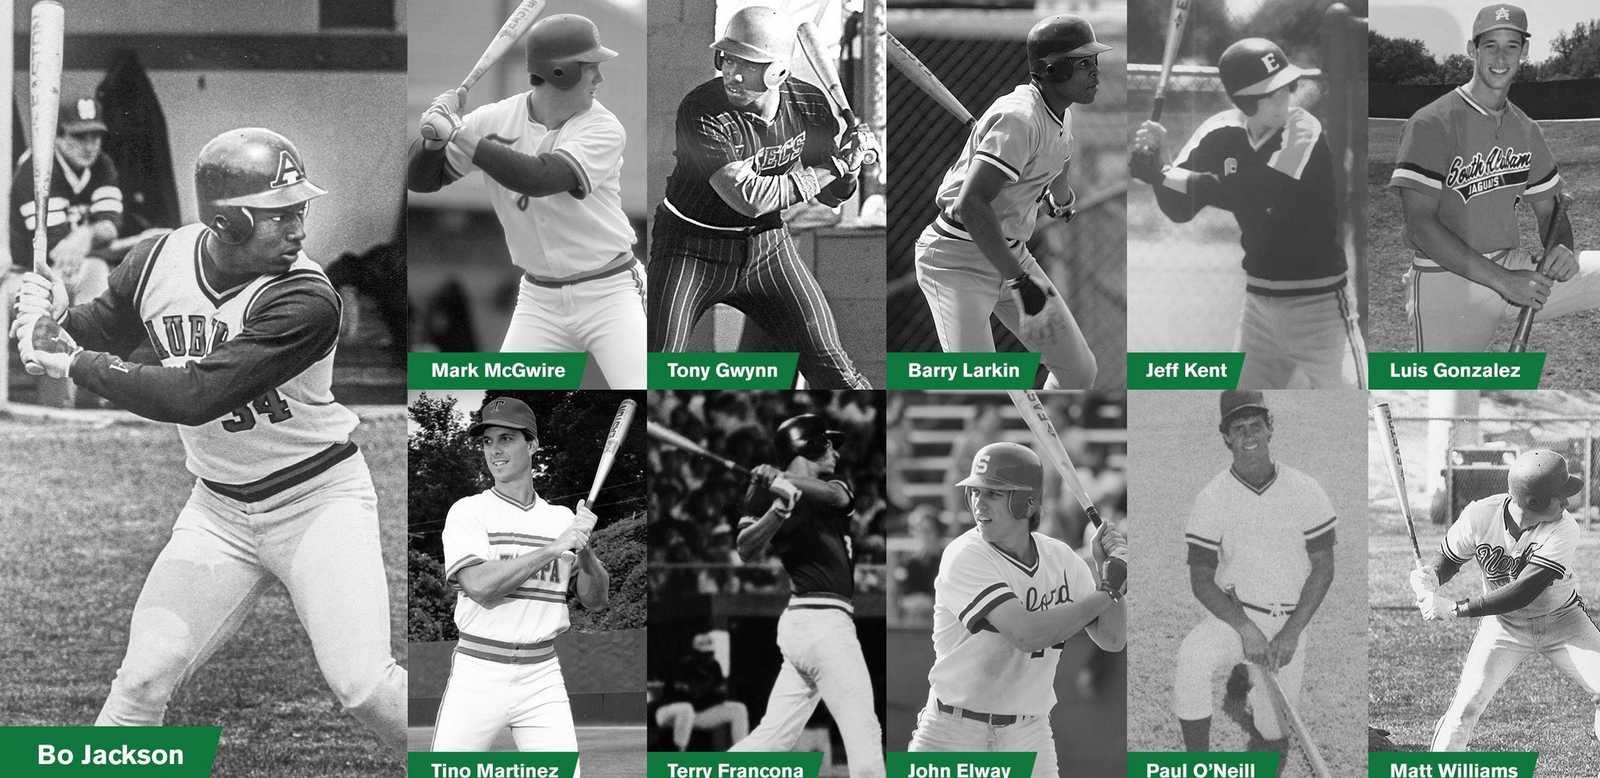 team-easton-baseball-softball